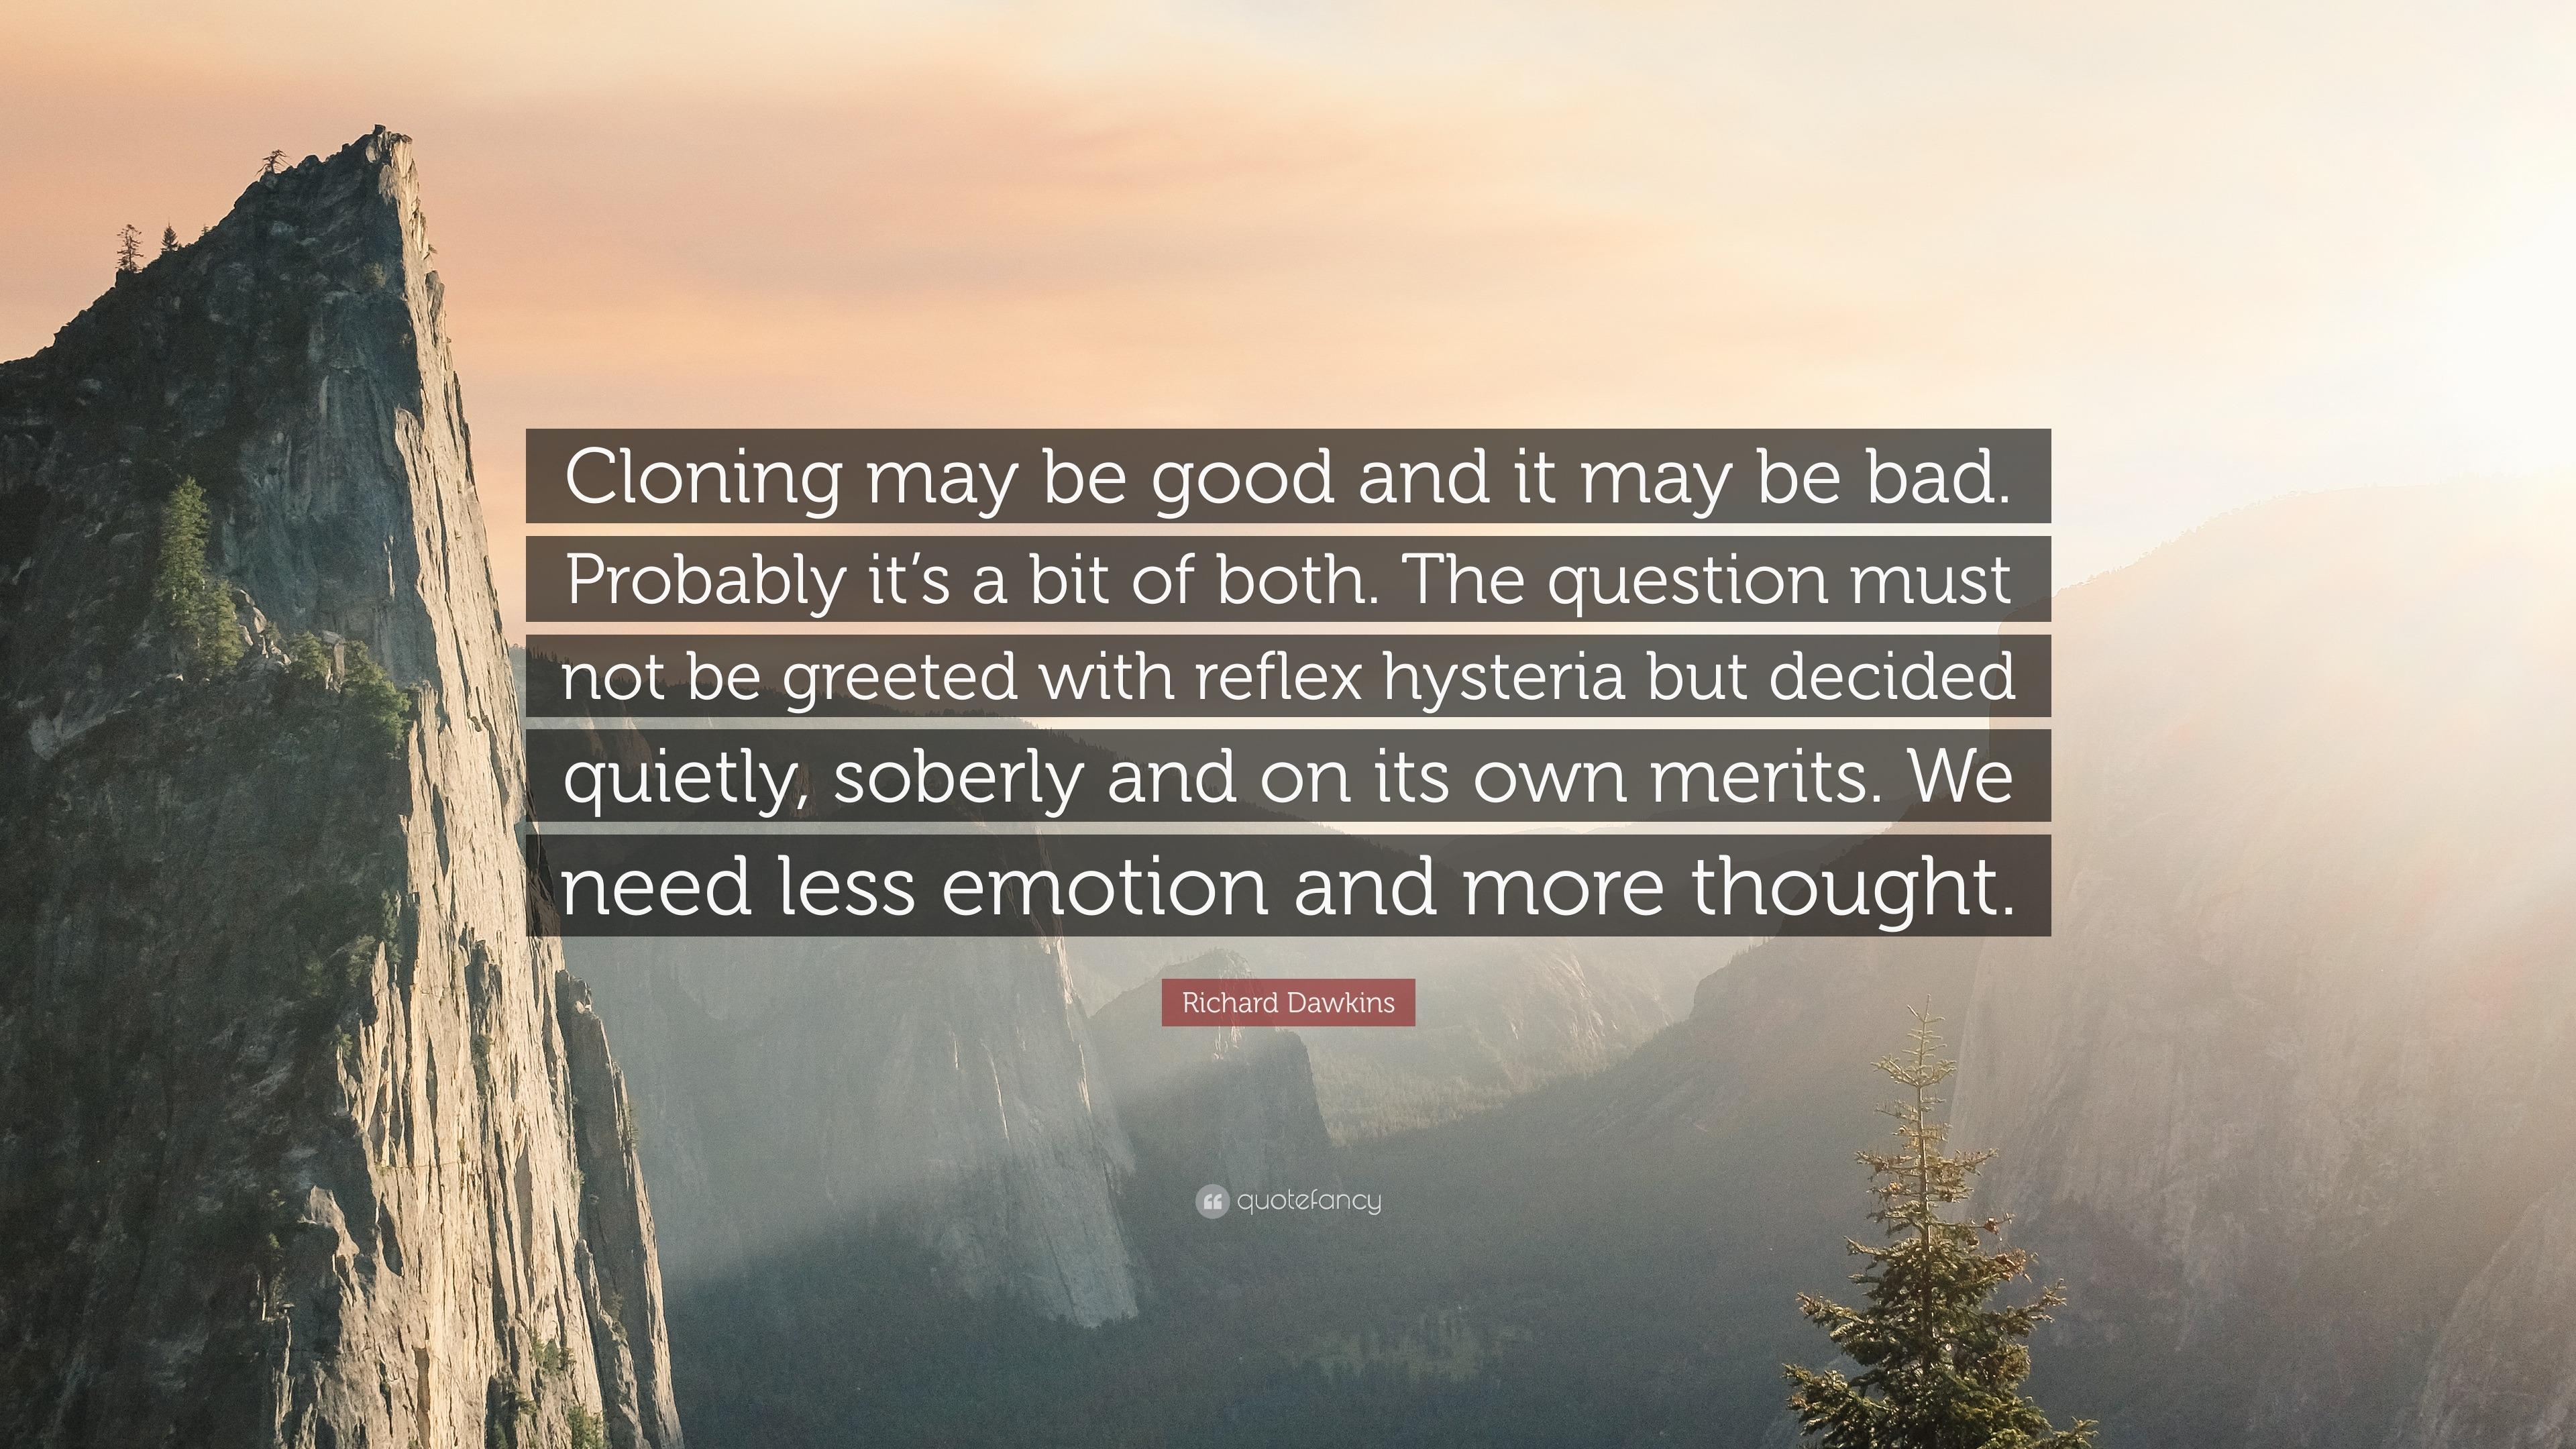 Richard Dawkins Quote u201cCloning may be good